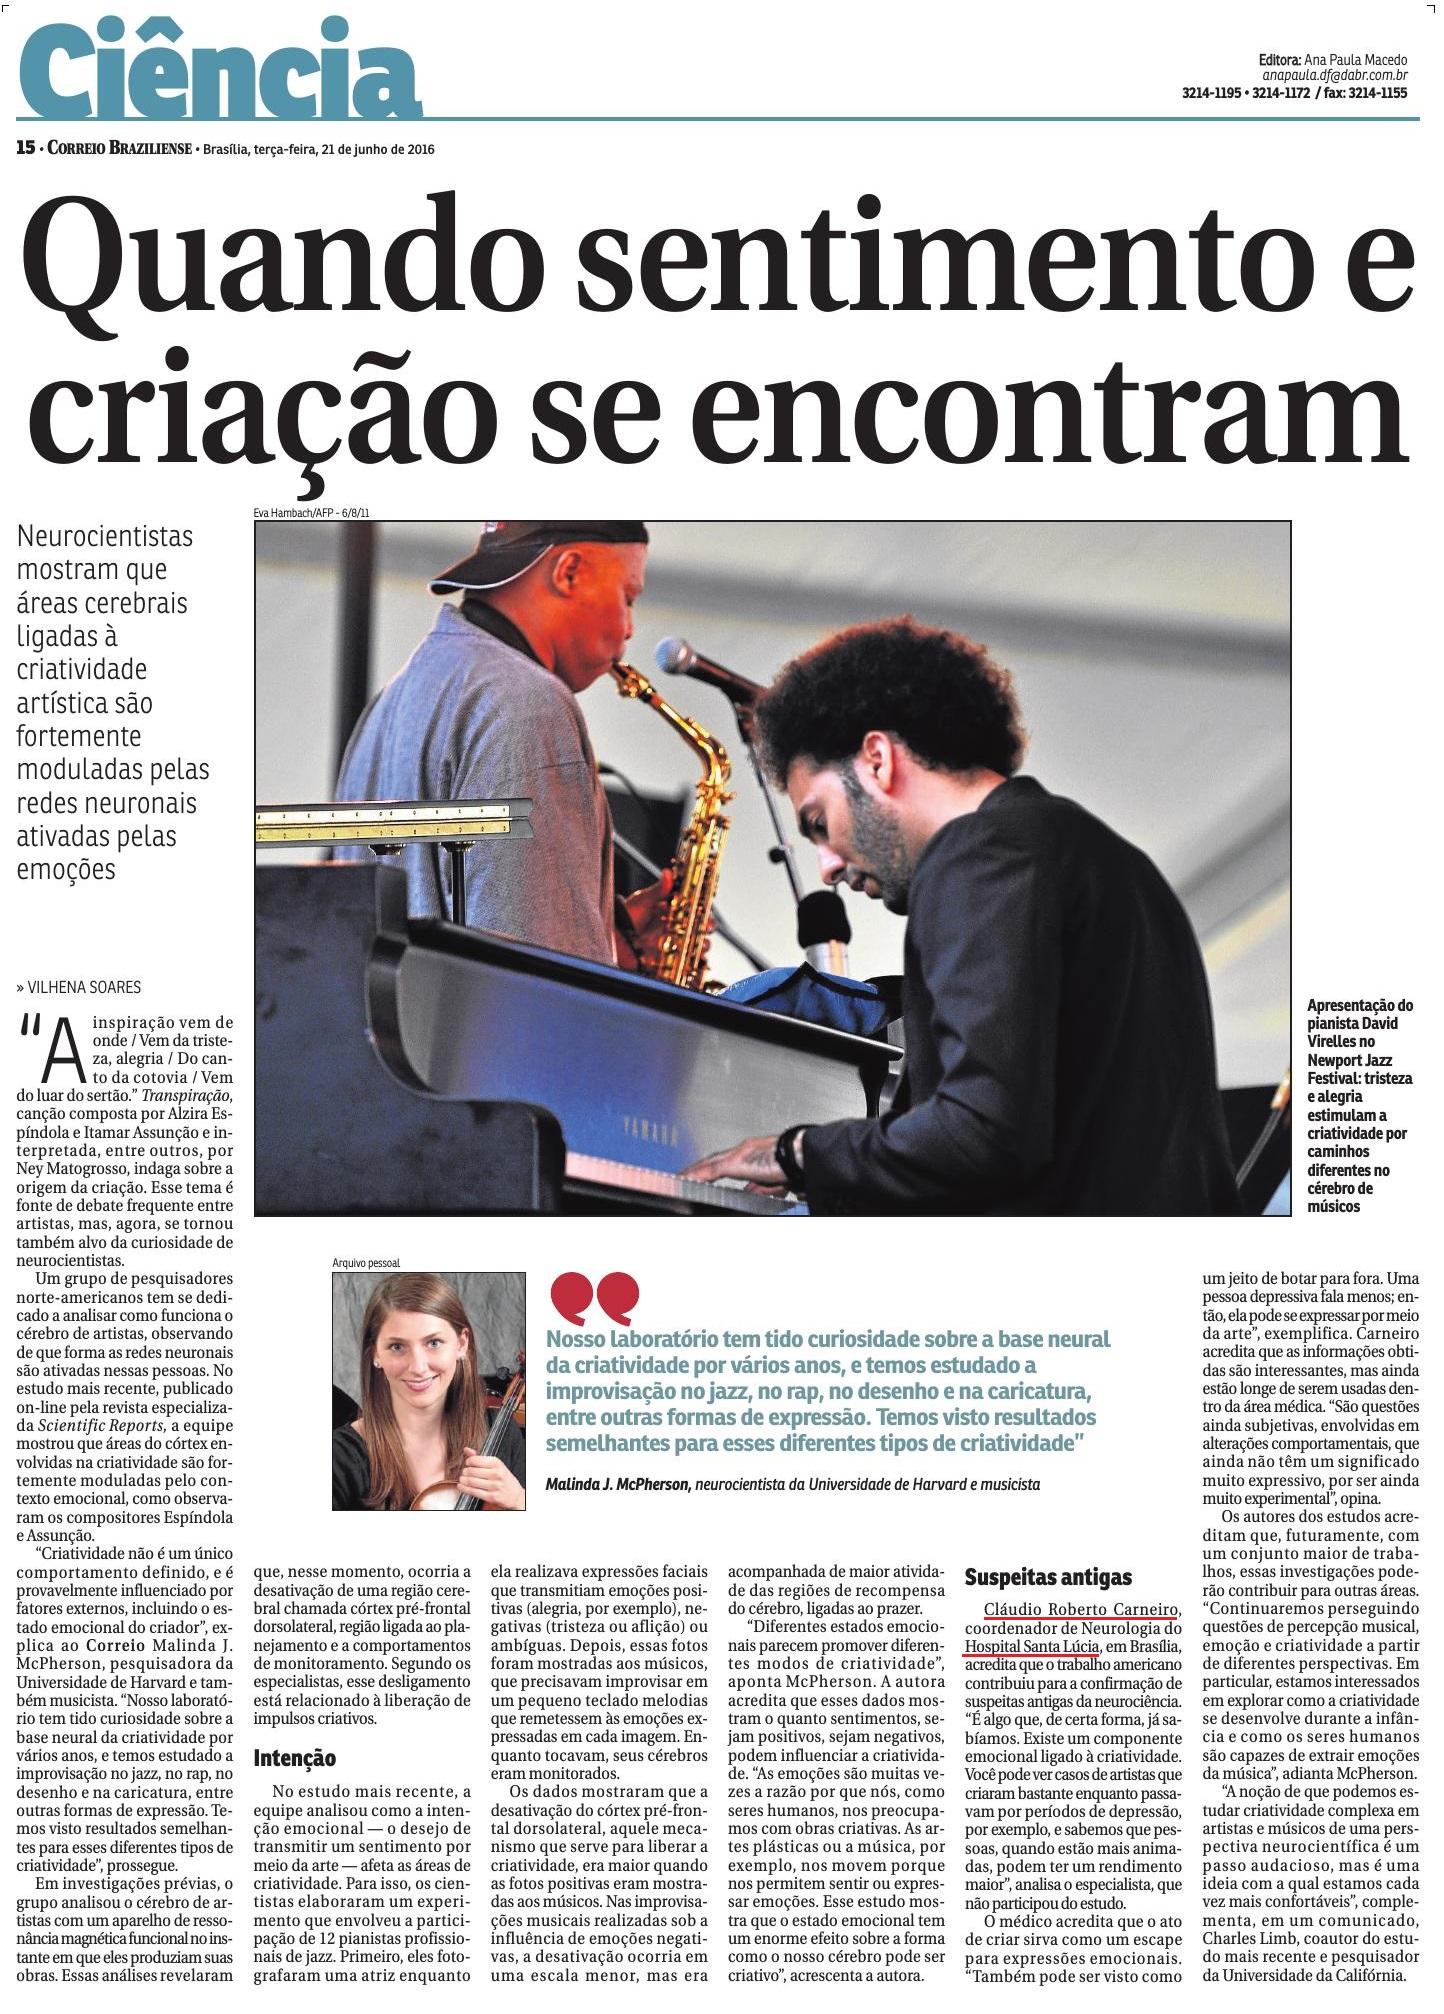 Correio Braziliense - Ciência Neurologia - HSL - 21-06-2016